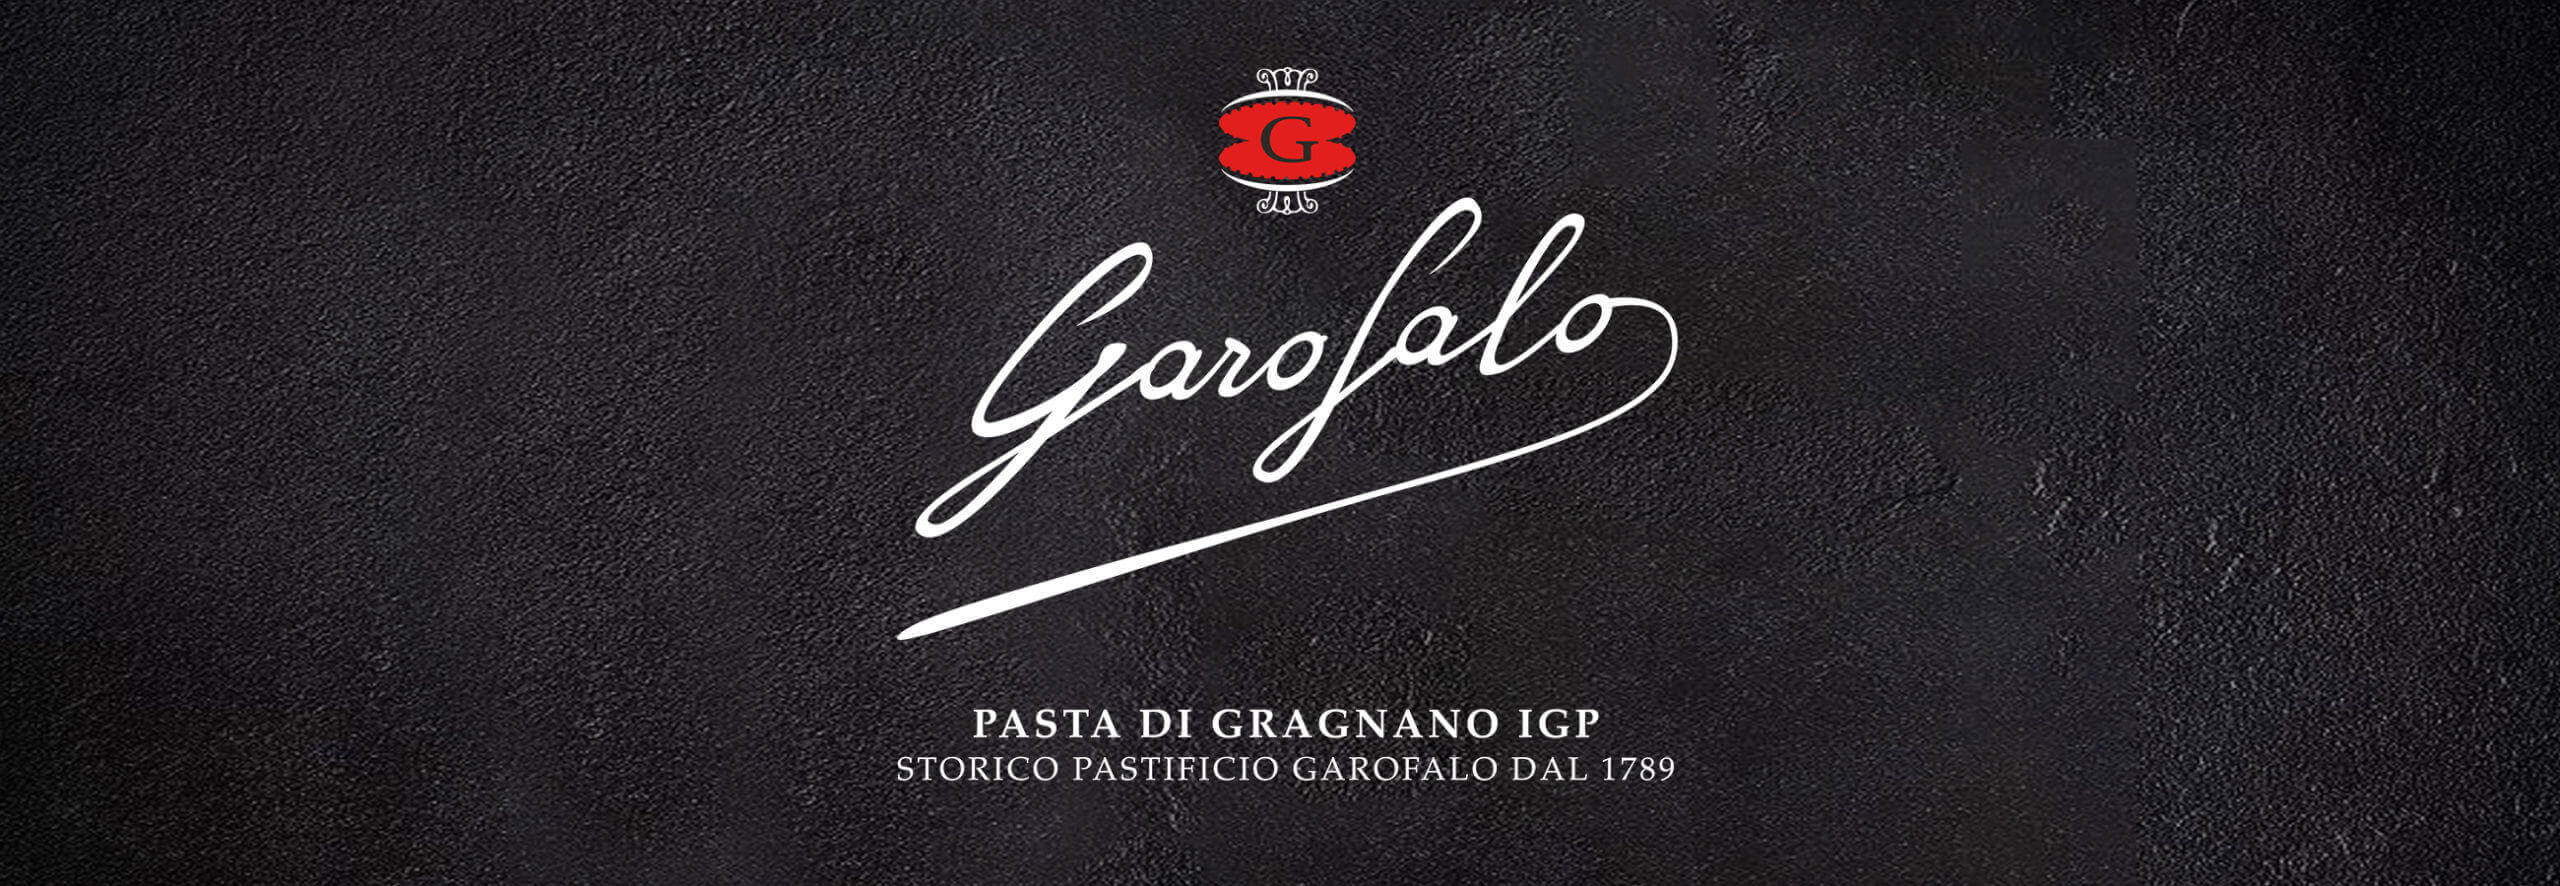 Garofalo Logo